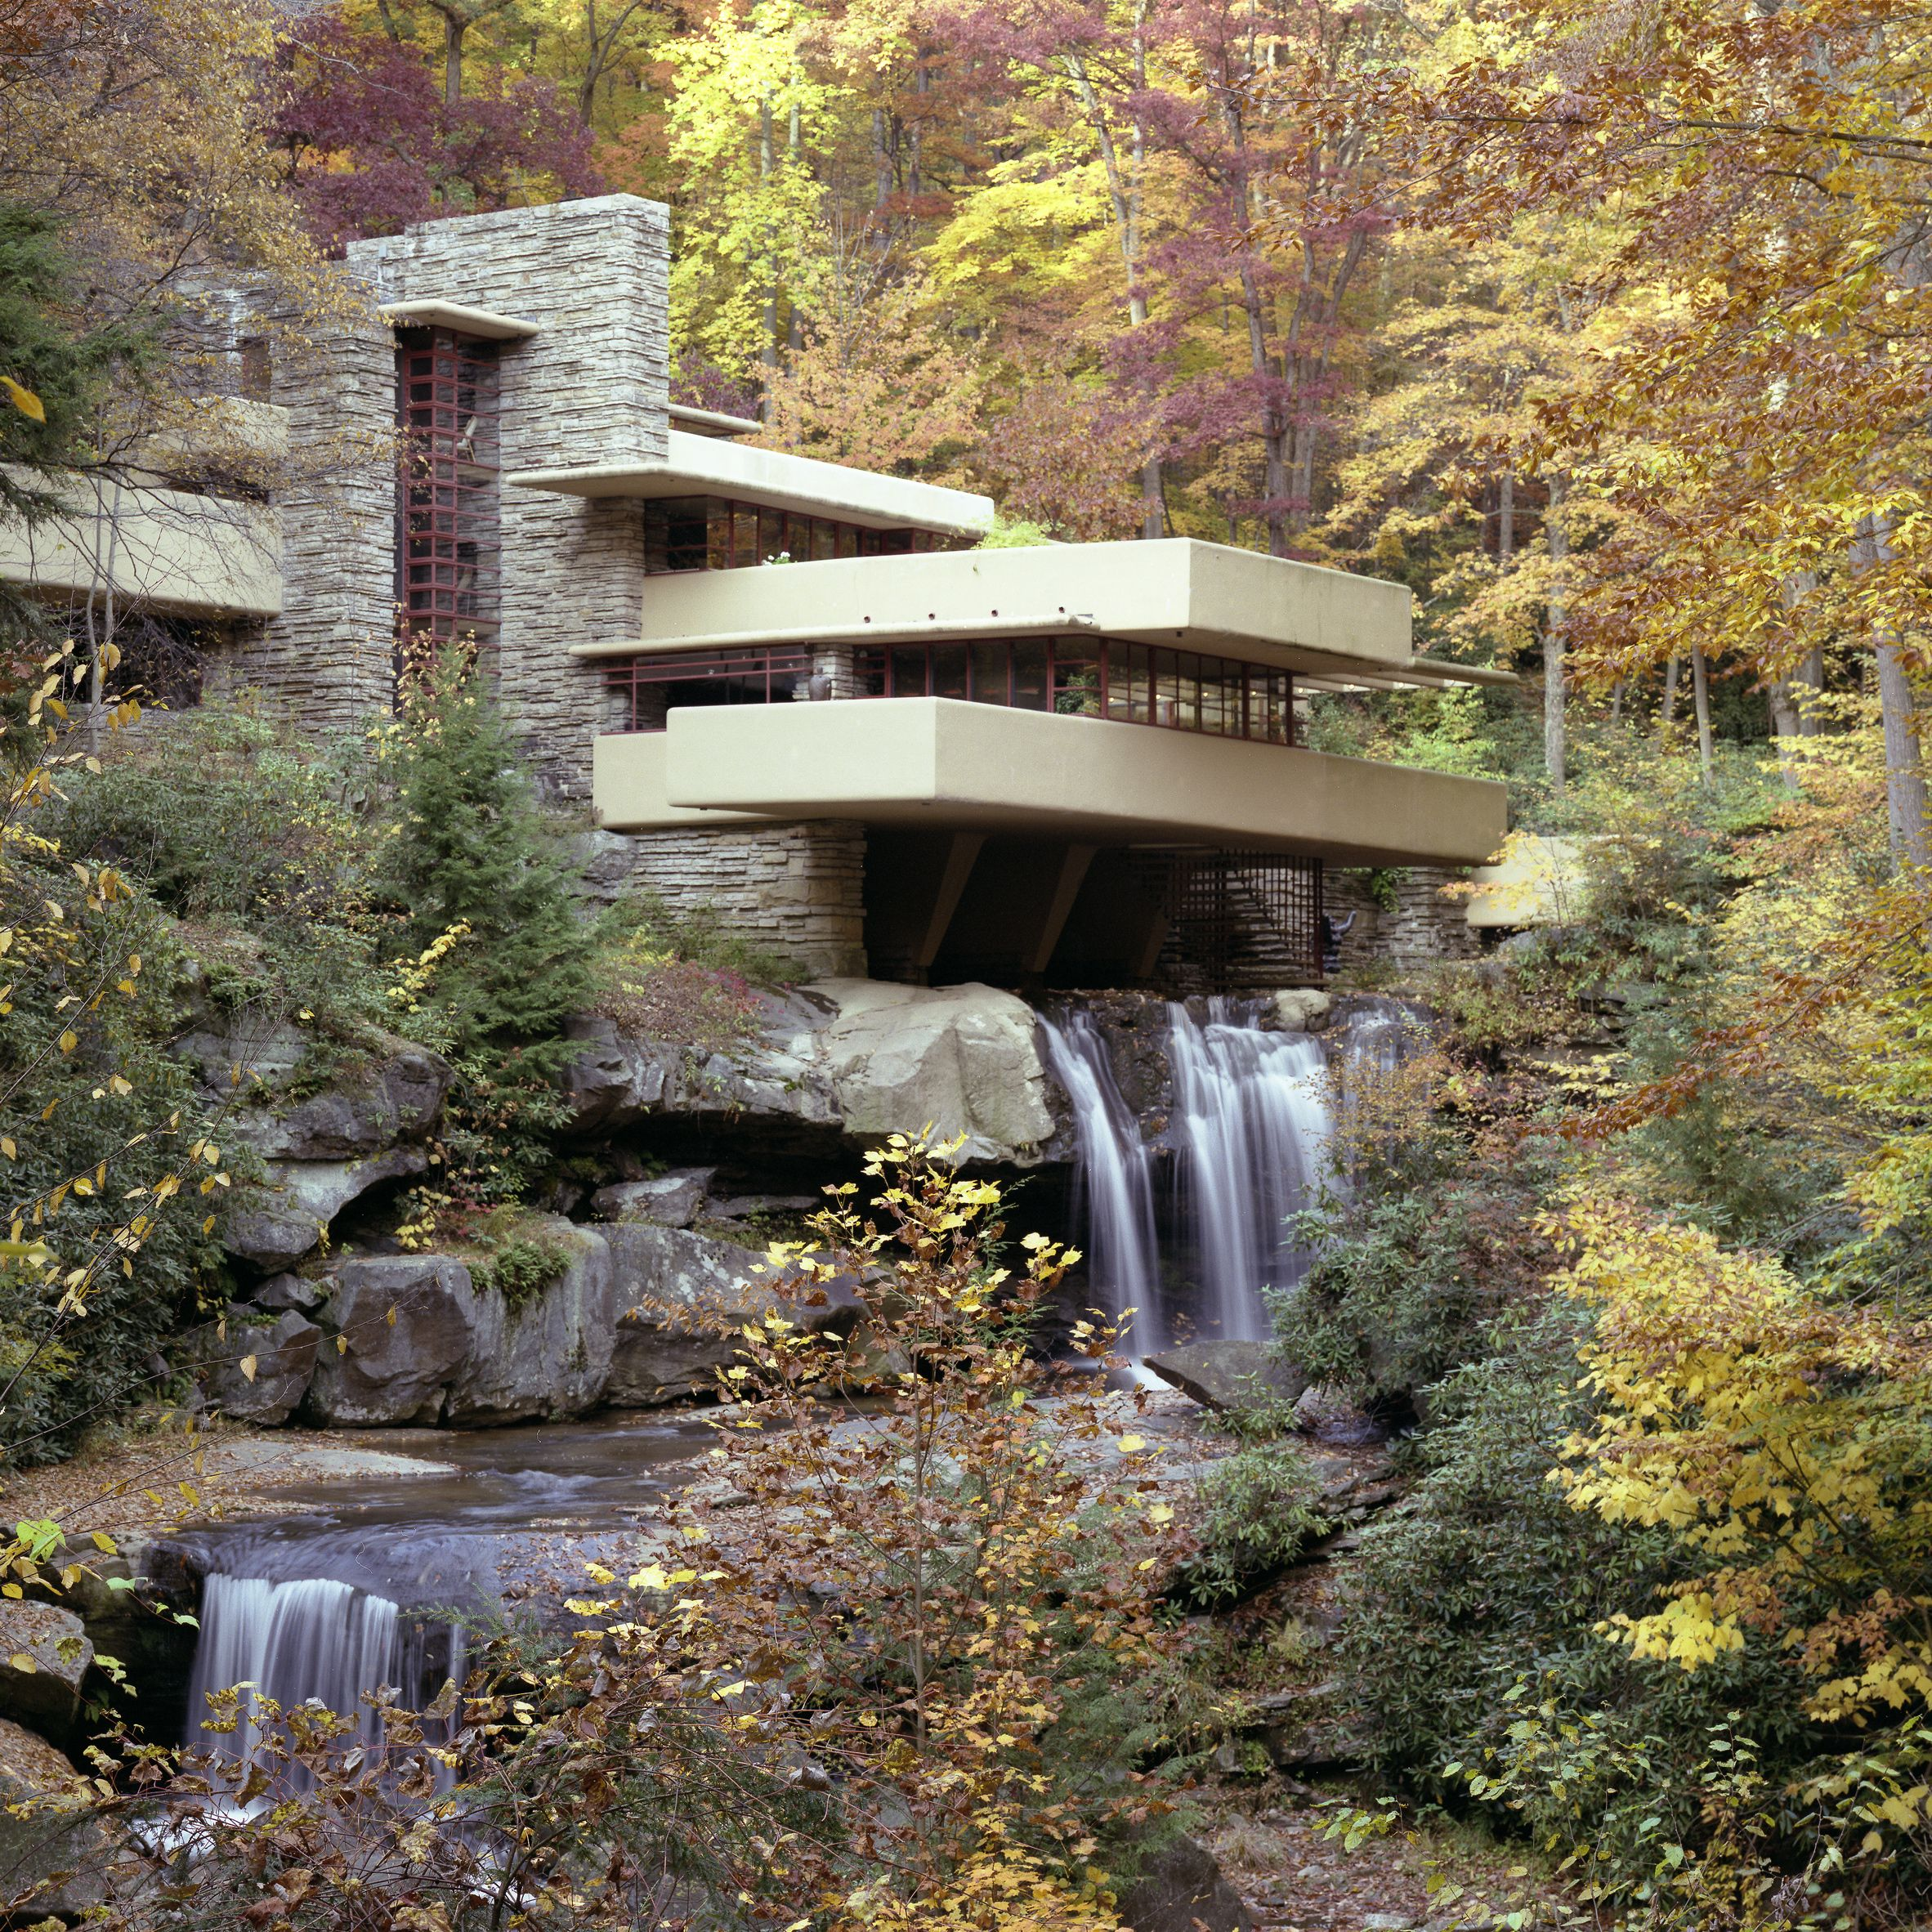 7 Amazing Houses Built Into Nature: Frank Lloyd Wright